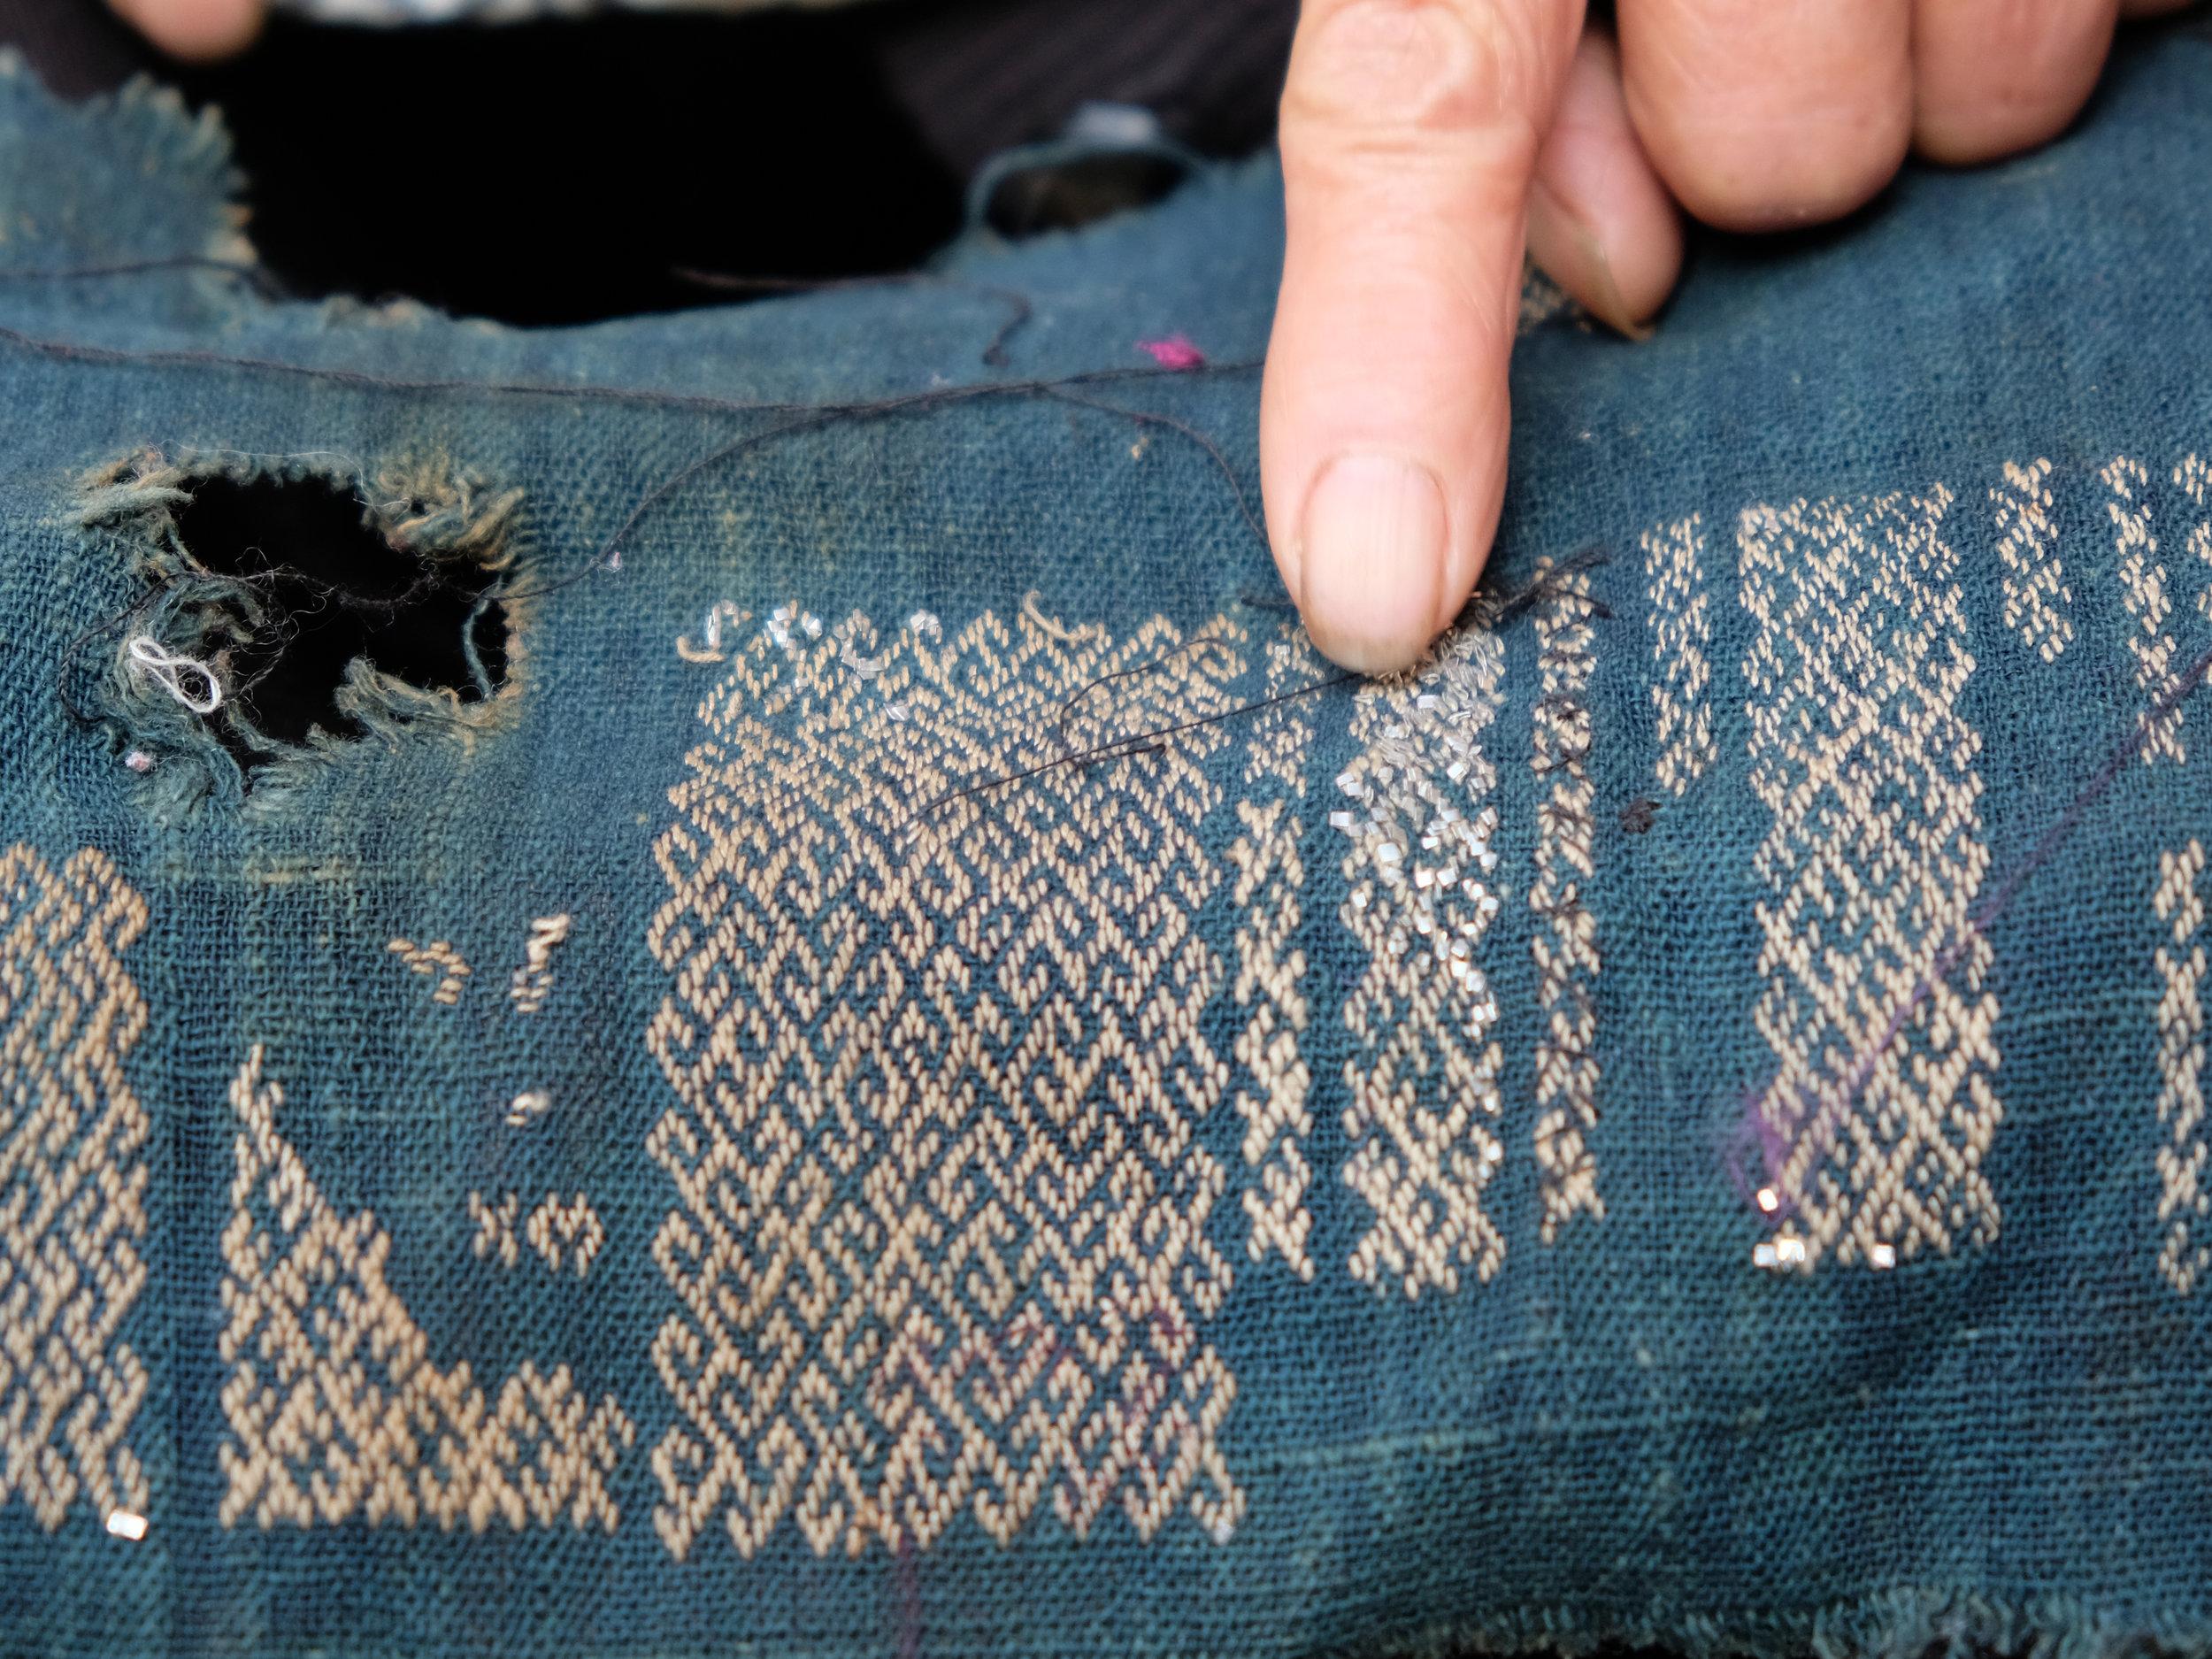 miao-tin-gimp-embroidery-in-zhanliu-china22